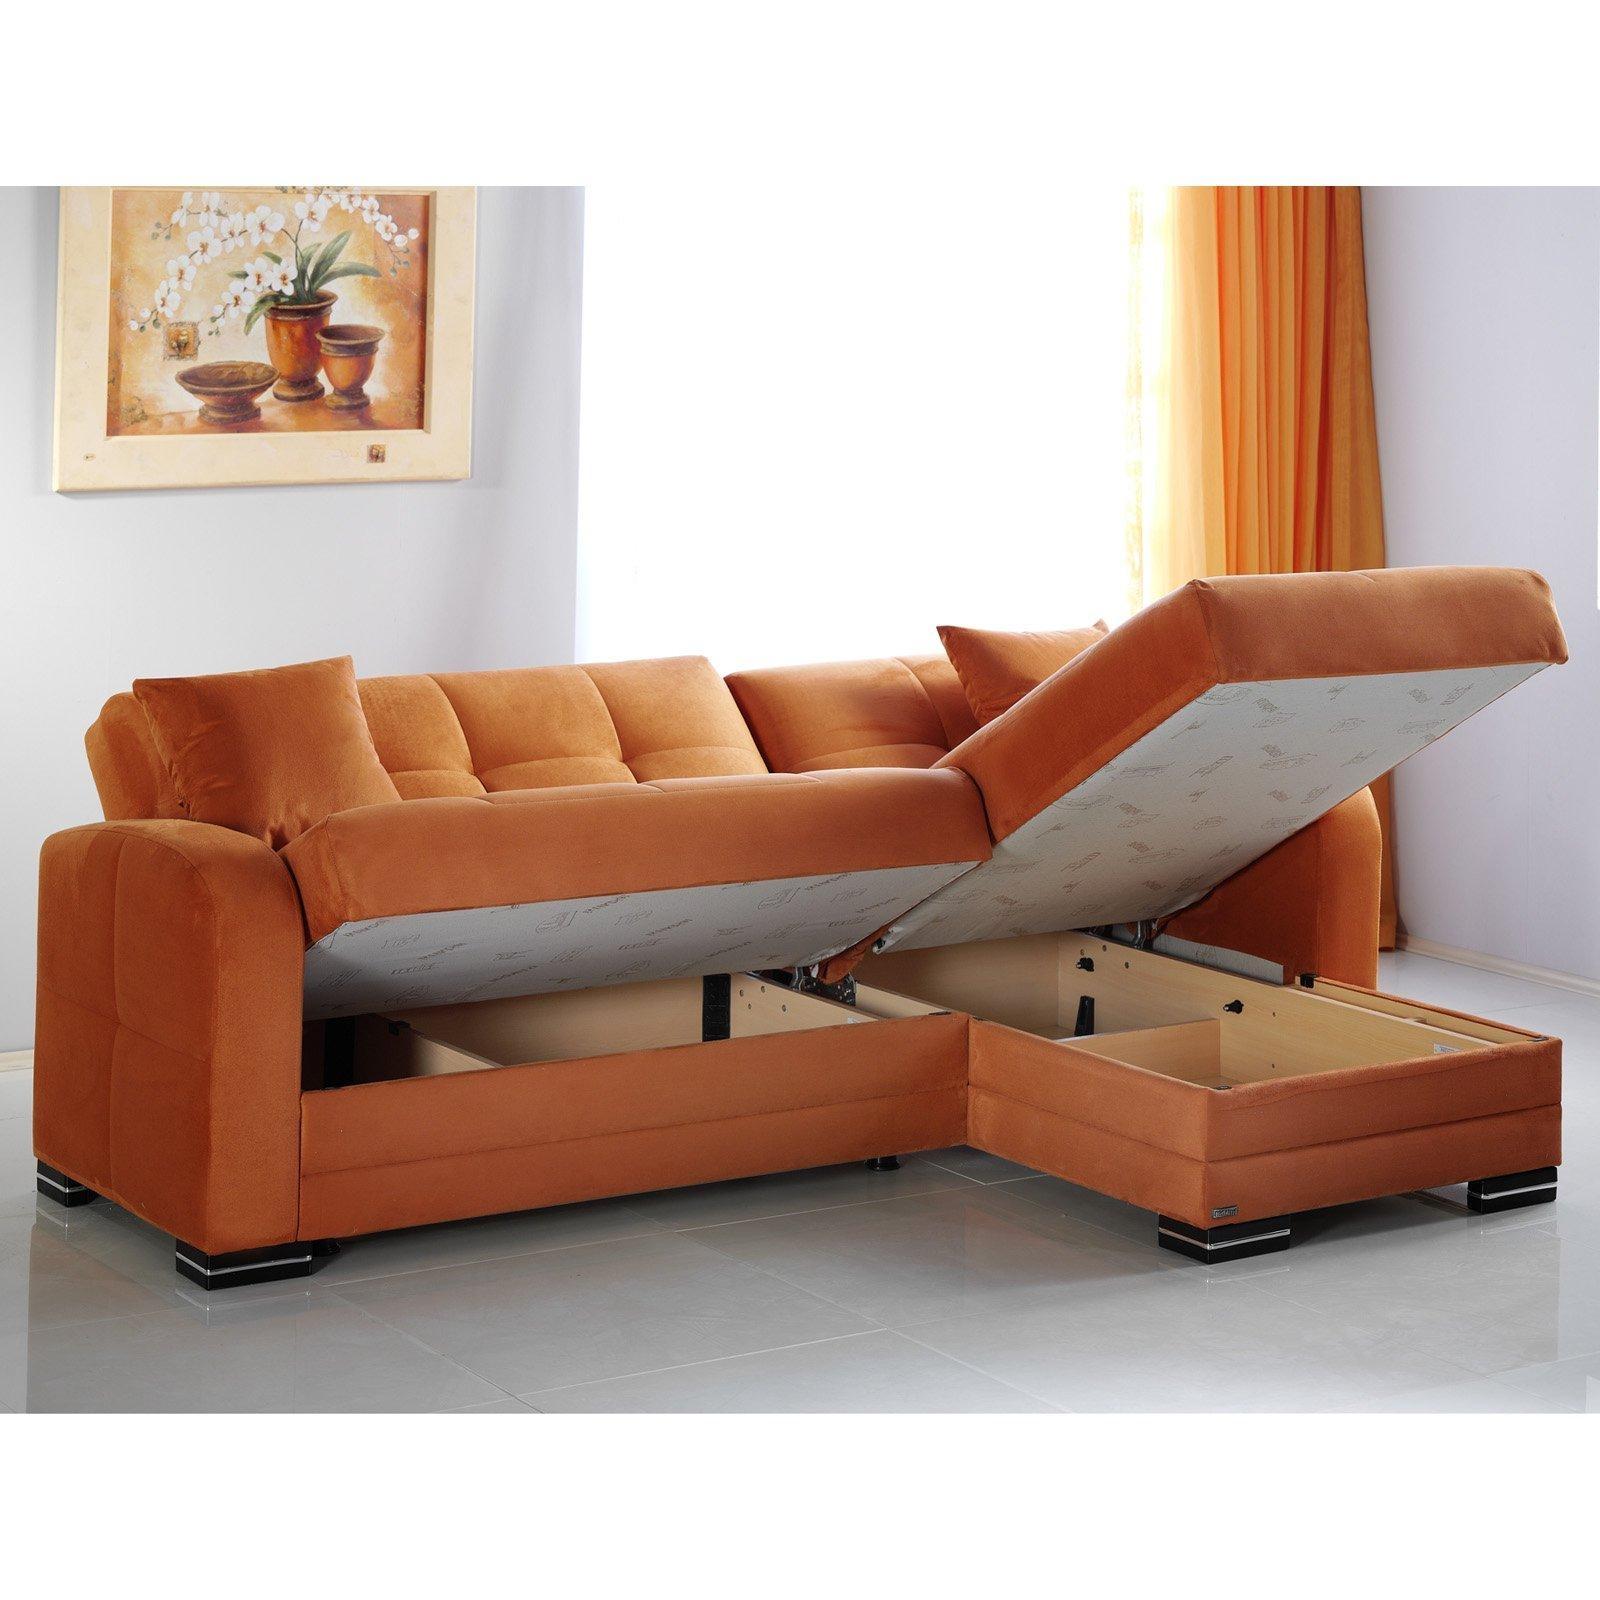 Istikbal Kubo Rainbow Orange Microfiber Sectional Sofa – Walmart Regarding Burnt Orange Sofas (View 16 of 20)